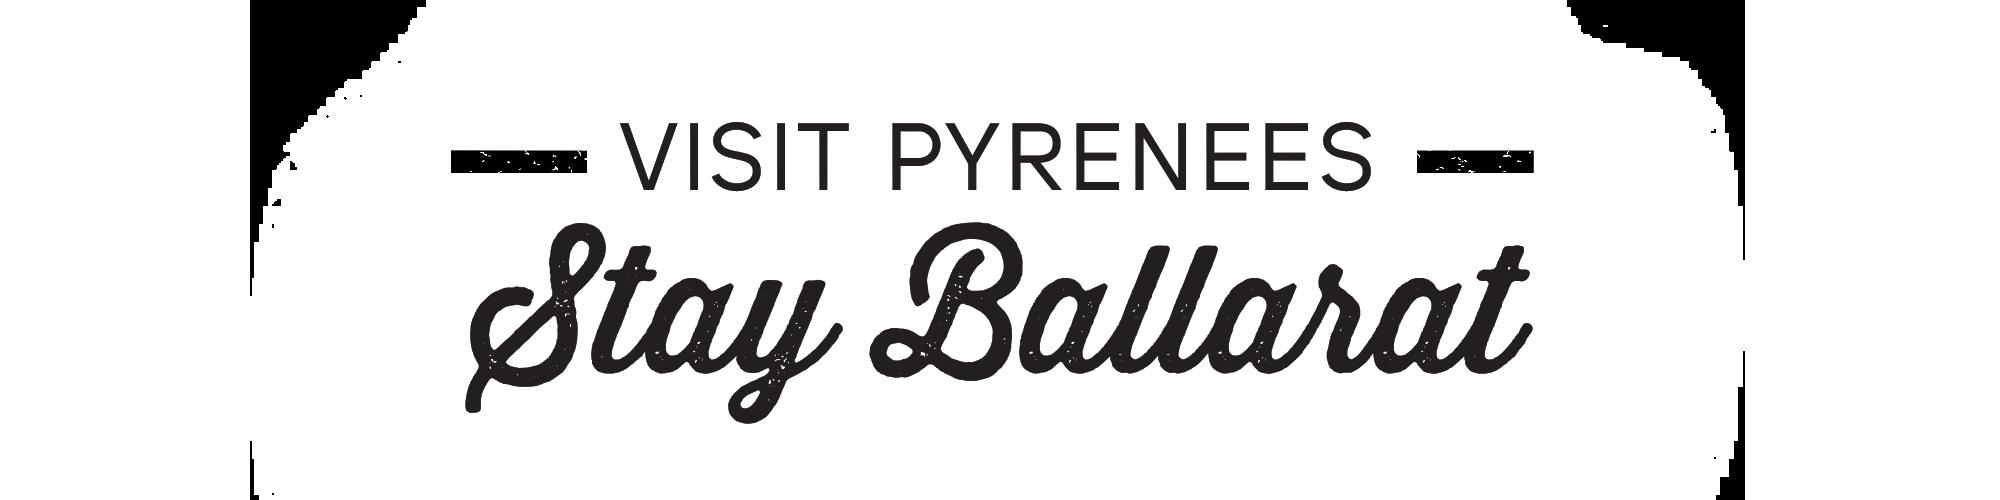 Stay Ballarat, Visit Pyrenees